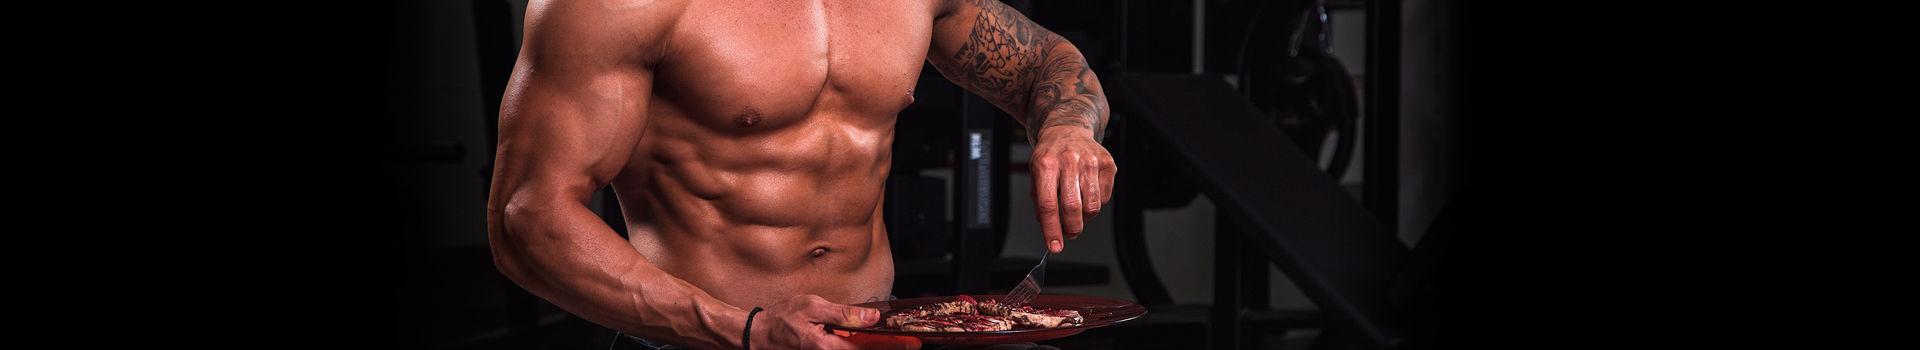 Deportista haciendo Dieta